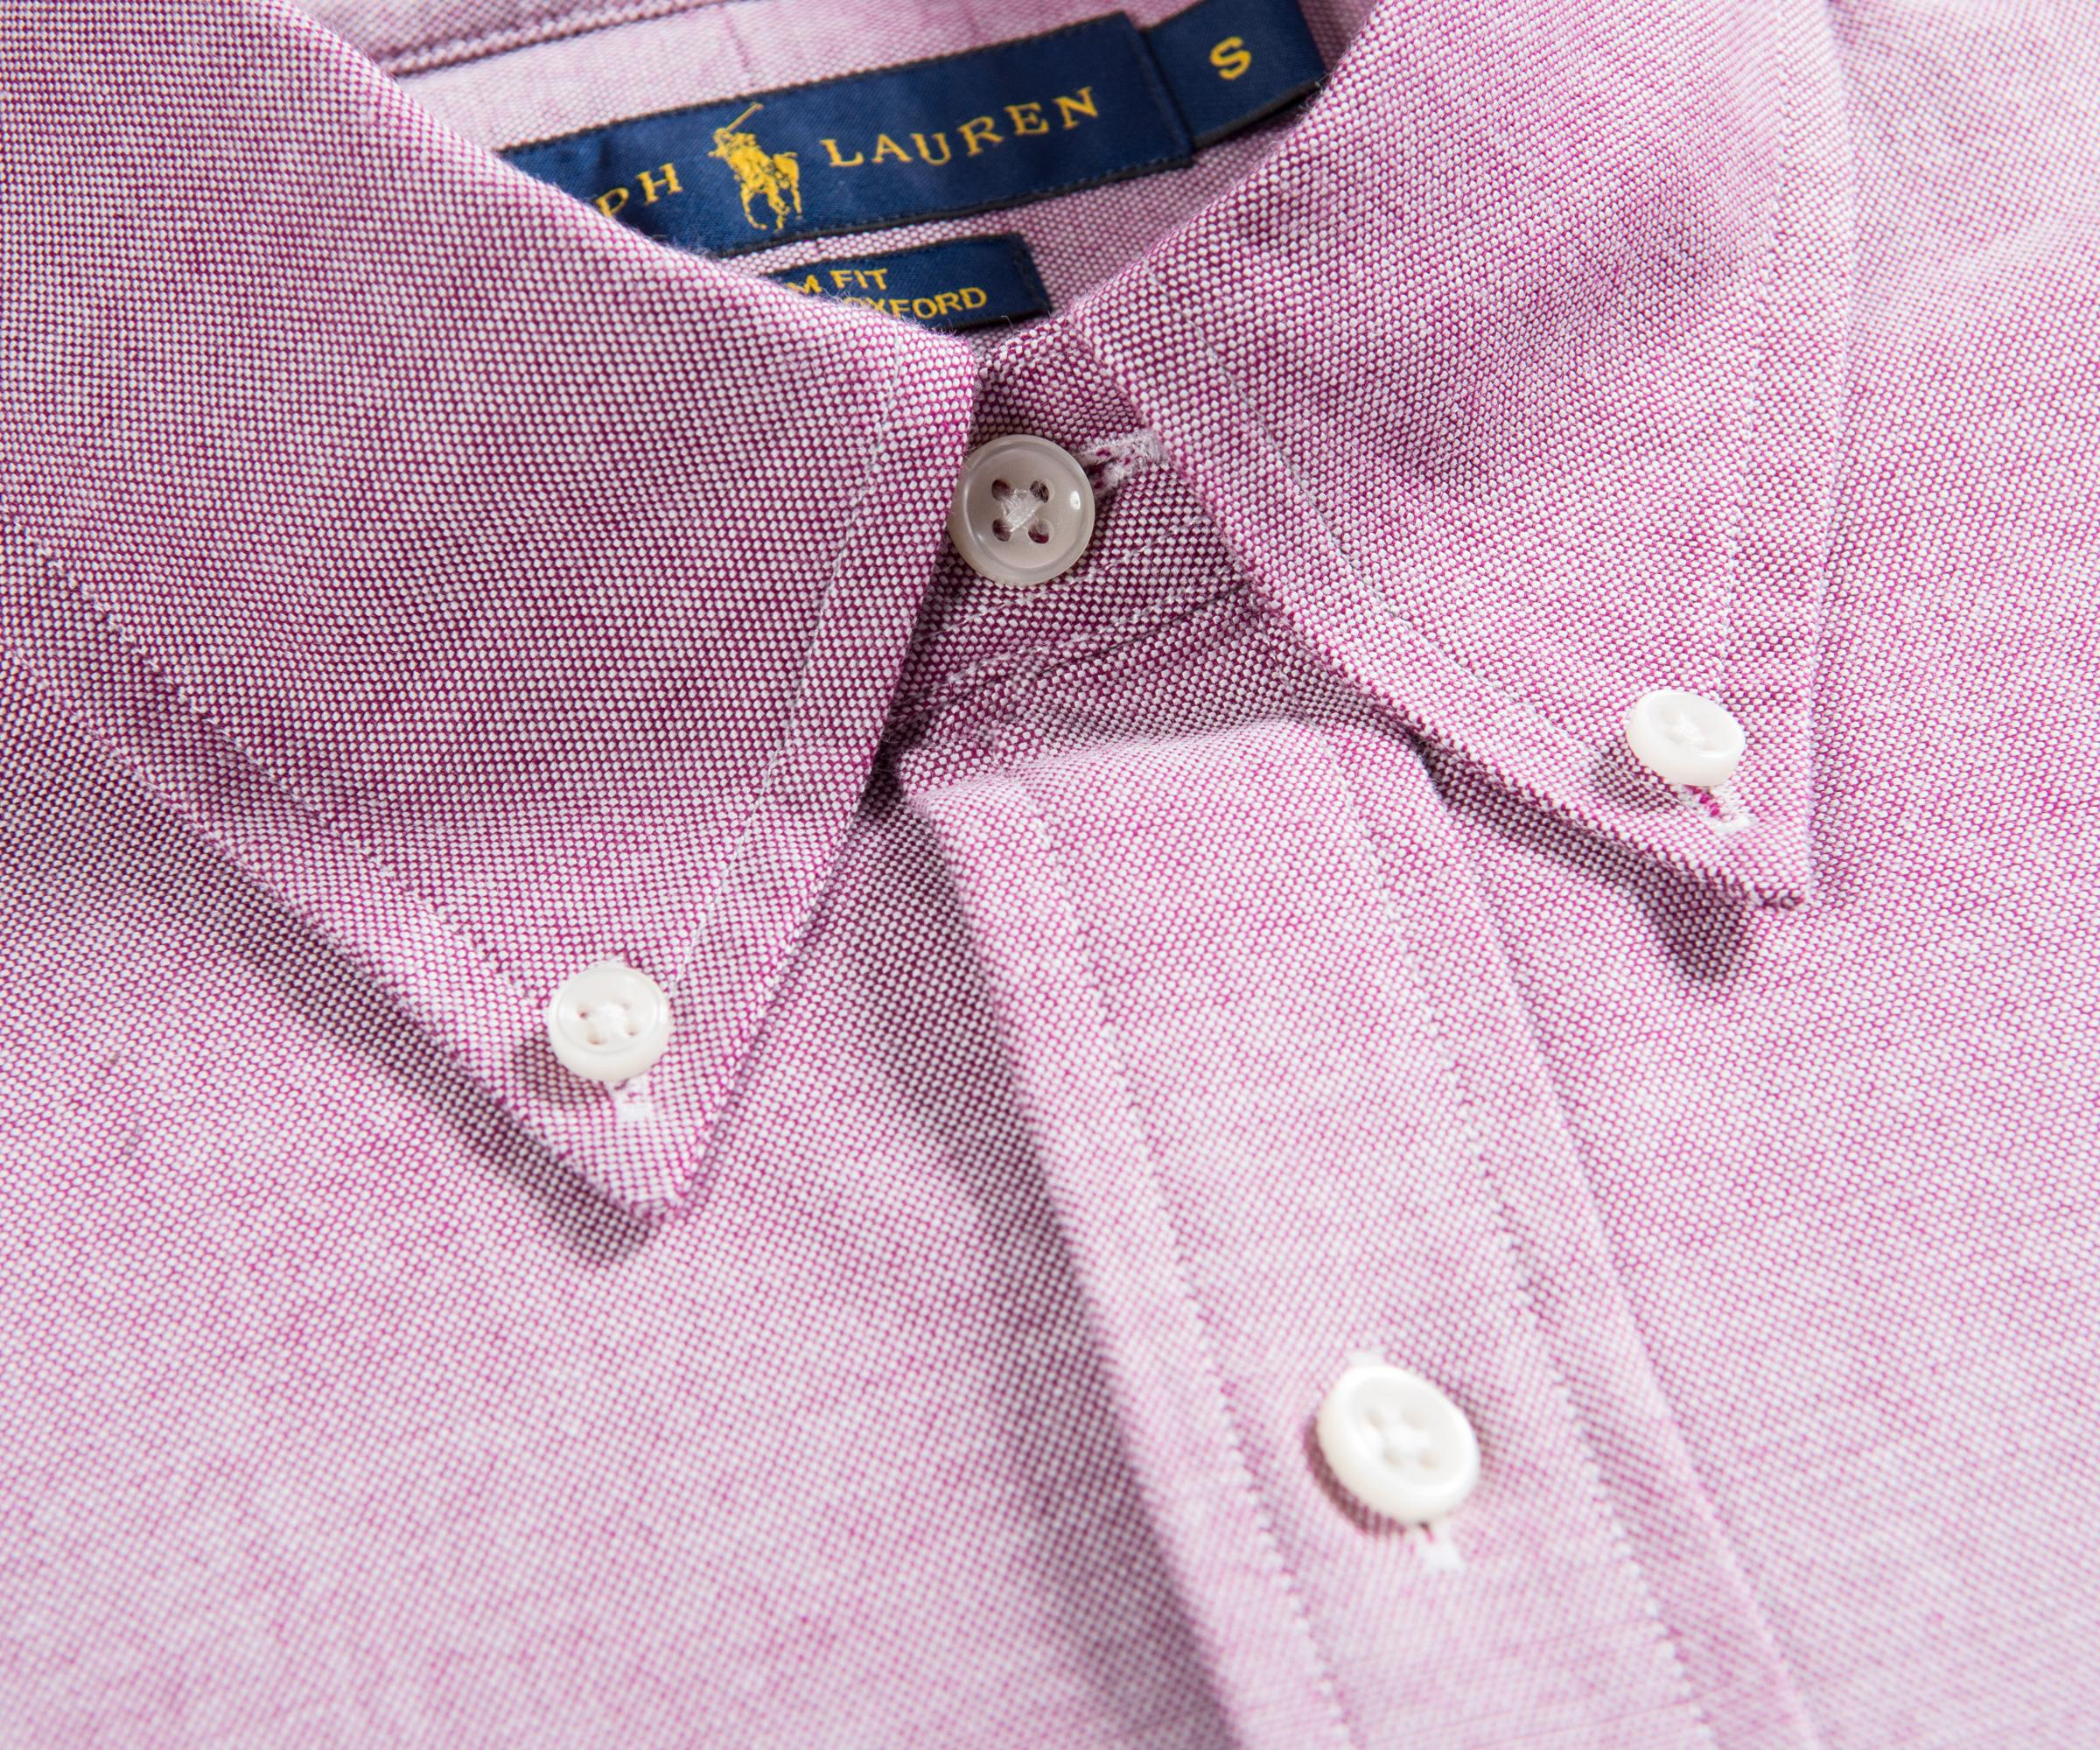 c2abfae3 Ralph Lauren Slim Fit Stretch Oxford Shirt Crimson/white in Purple ...